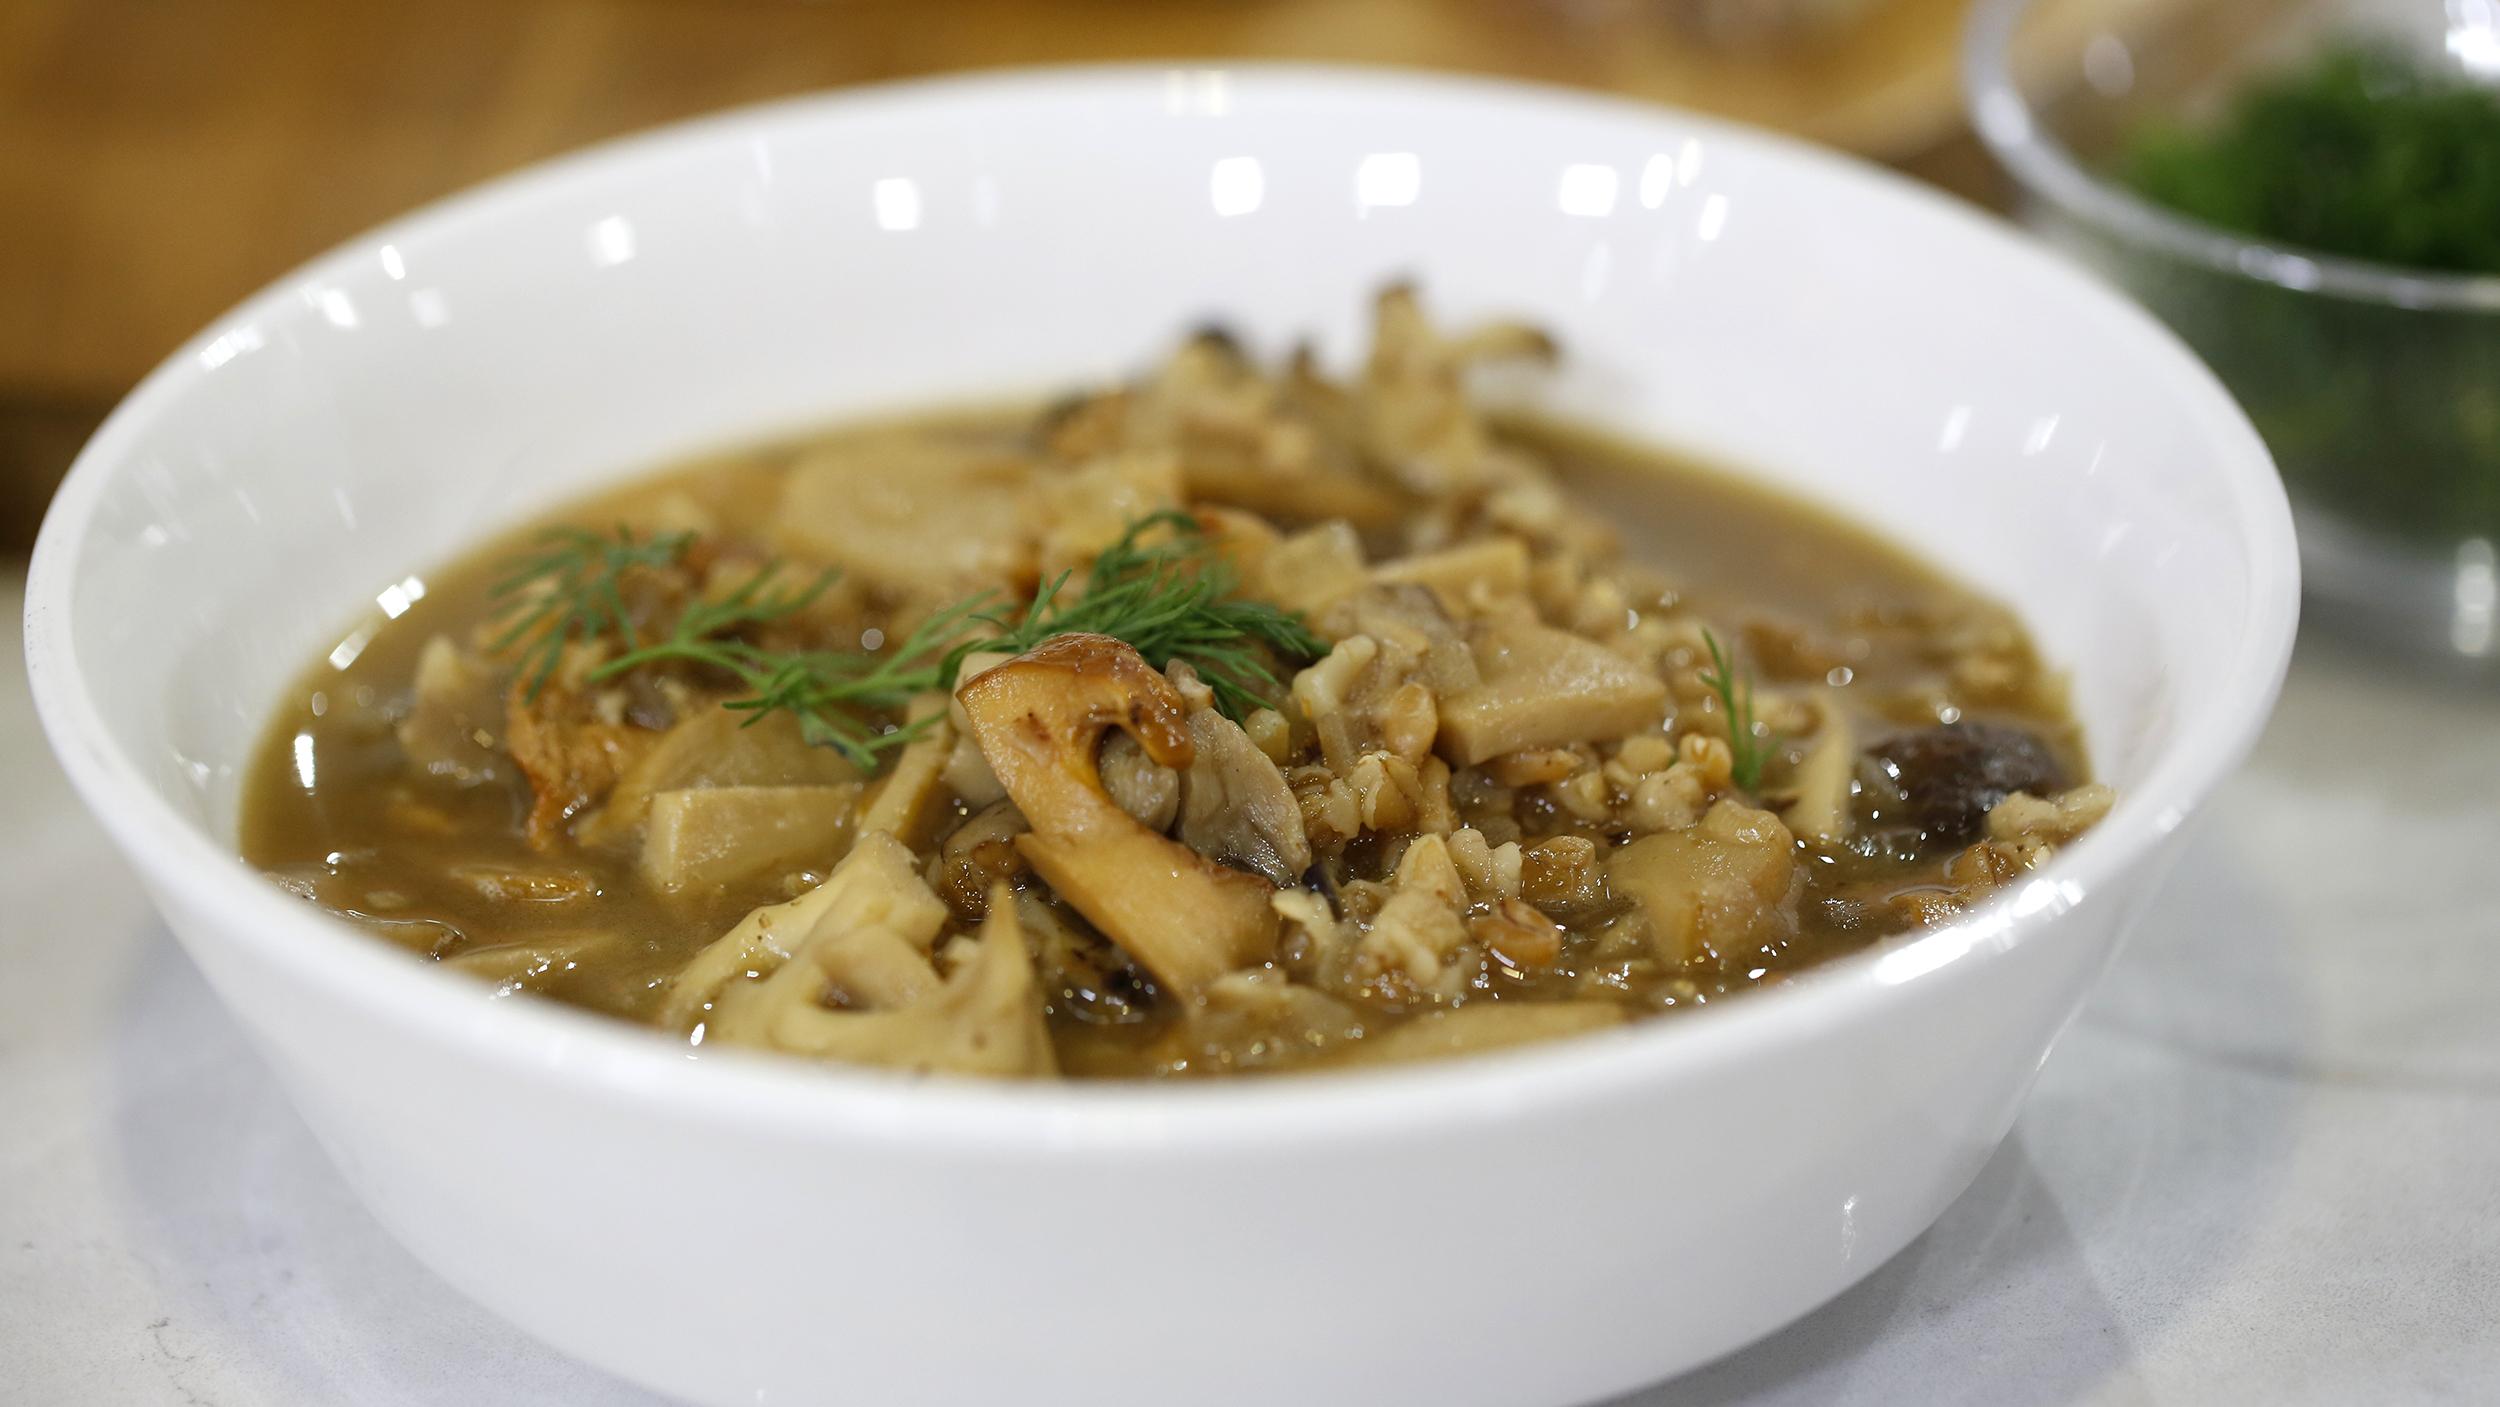 Warm up with Martha Stewart's farro-mushroom soup - TODAY.com